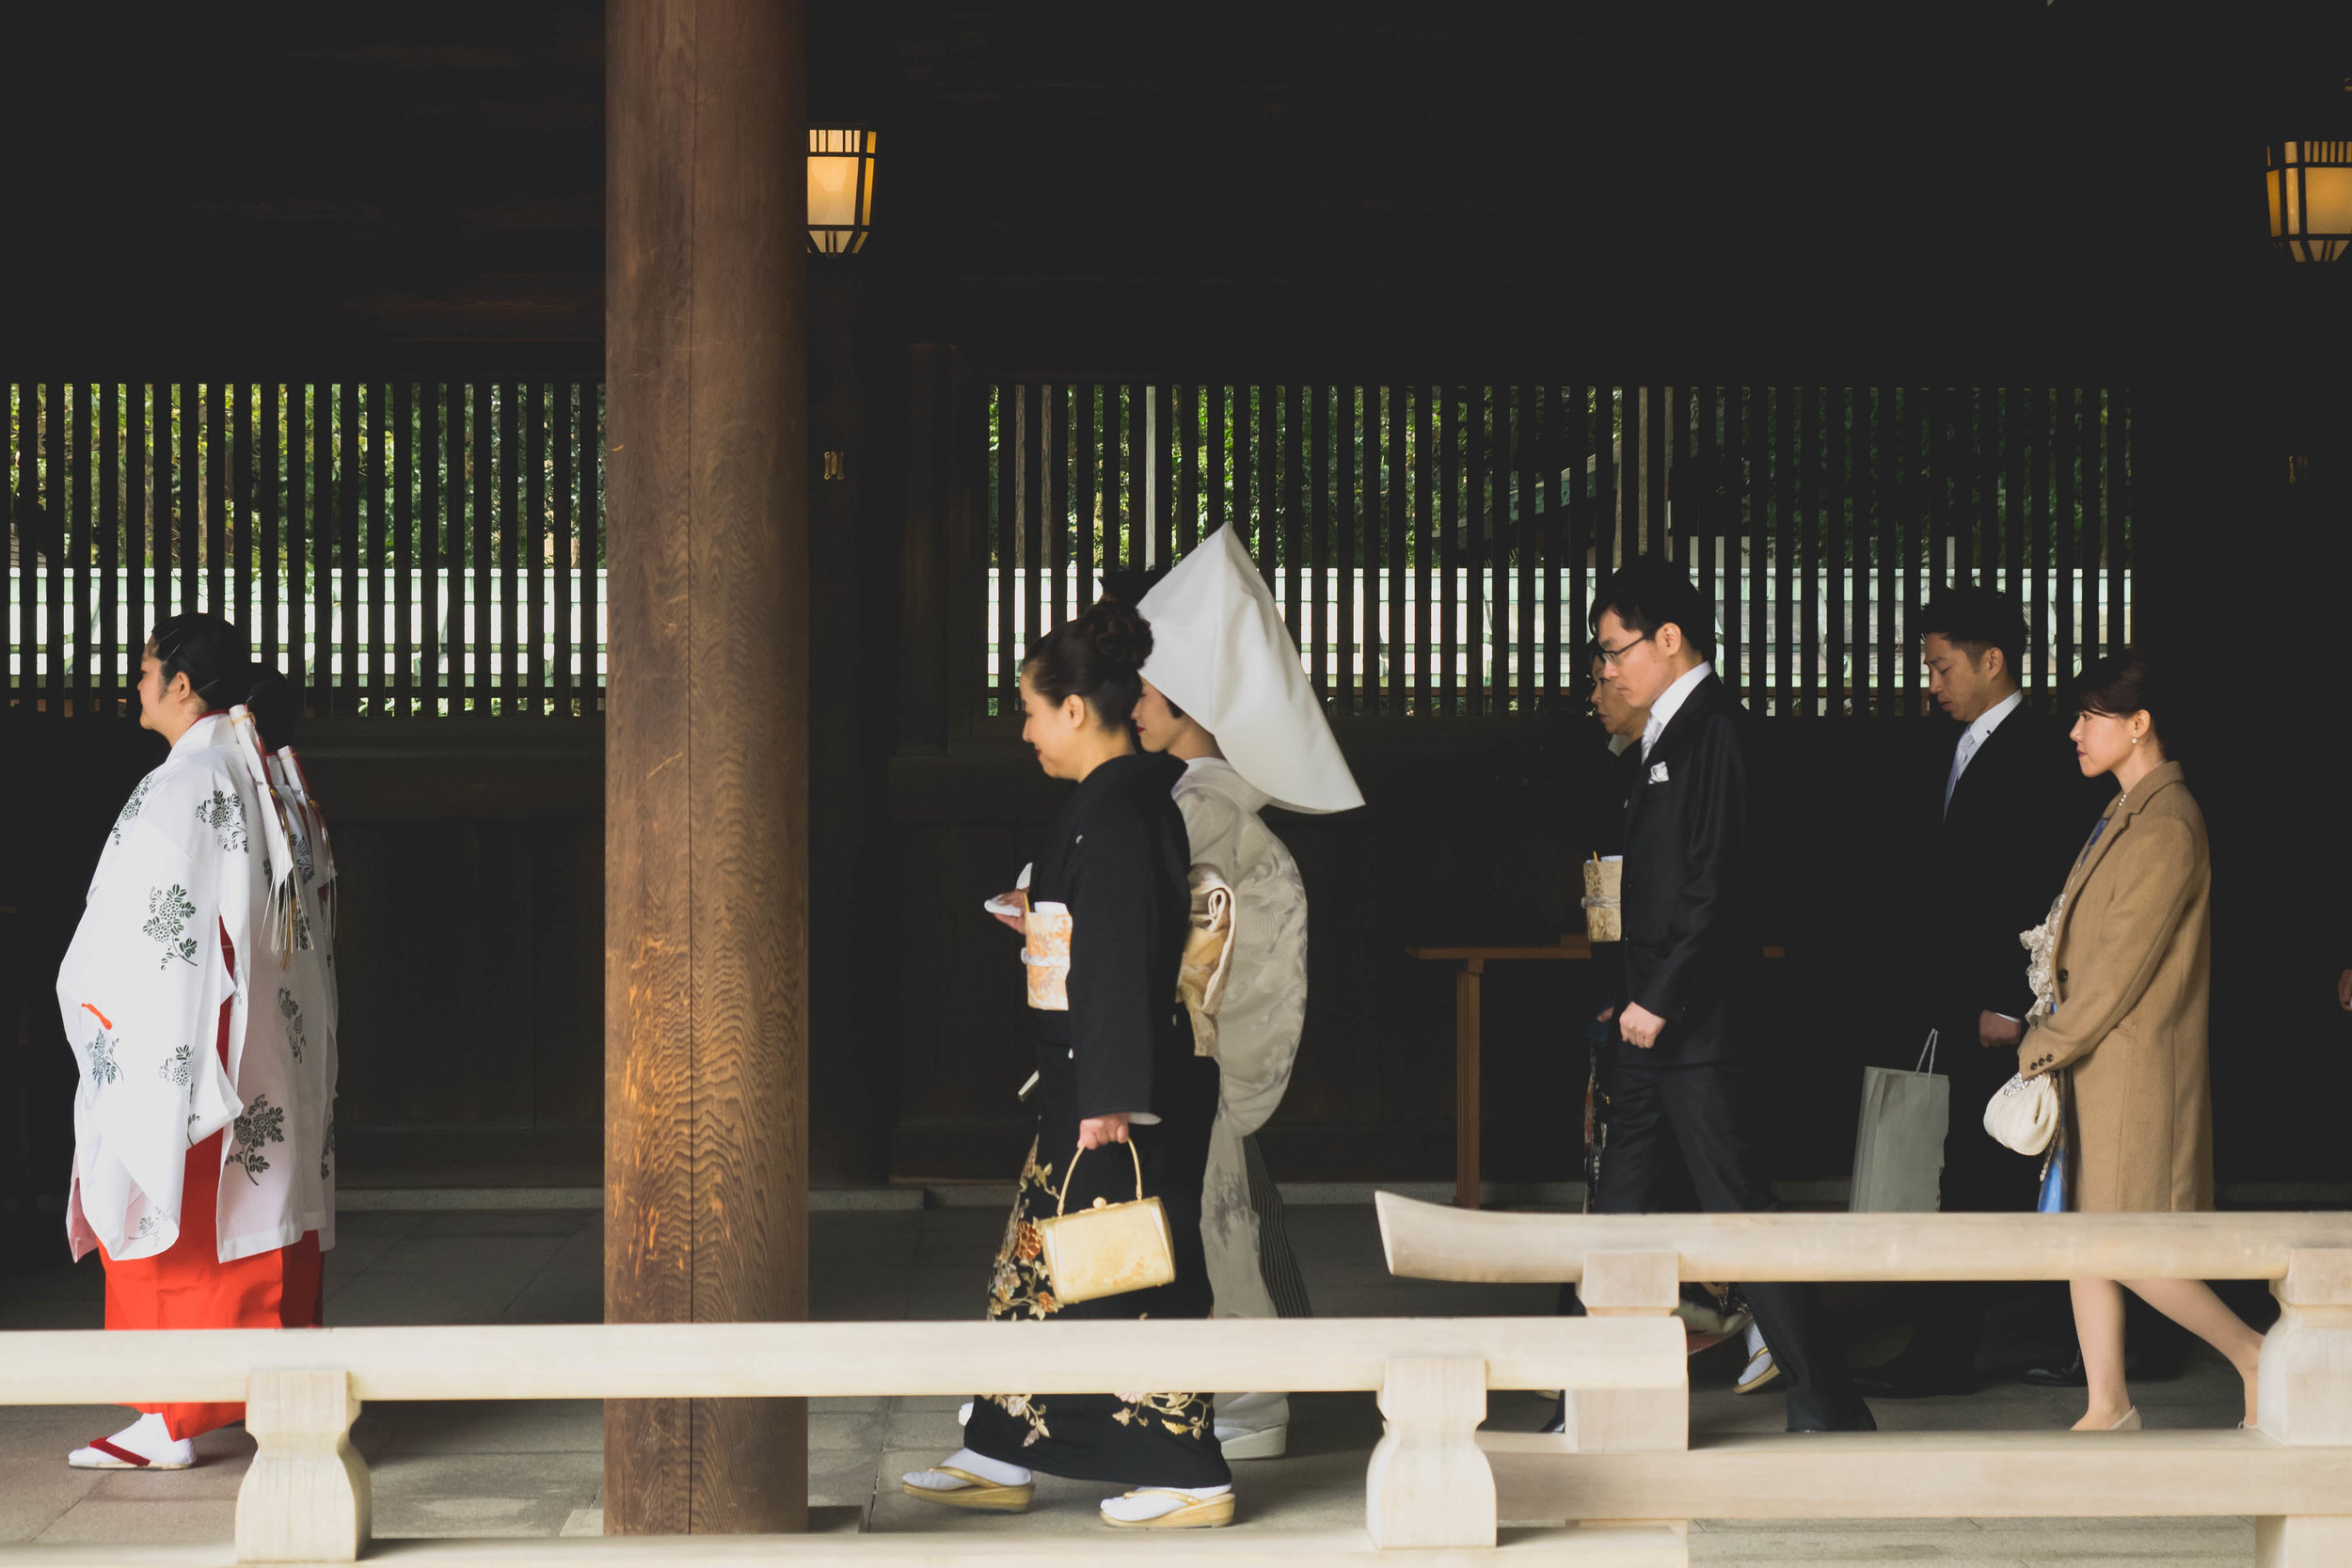 wedding spotted at meiji jingu shrine.